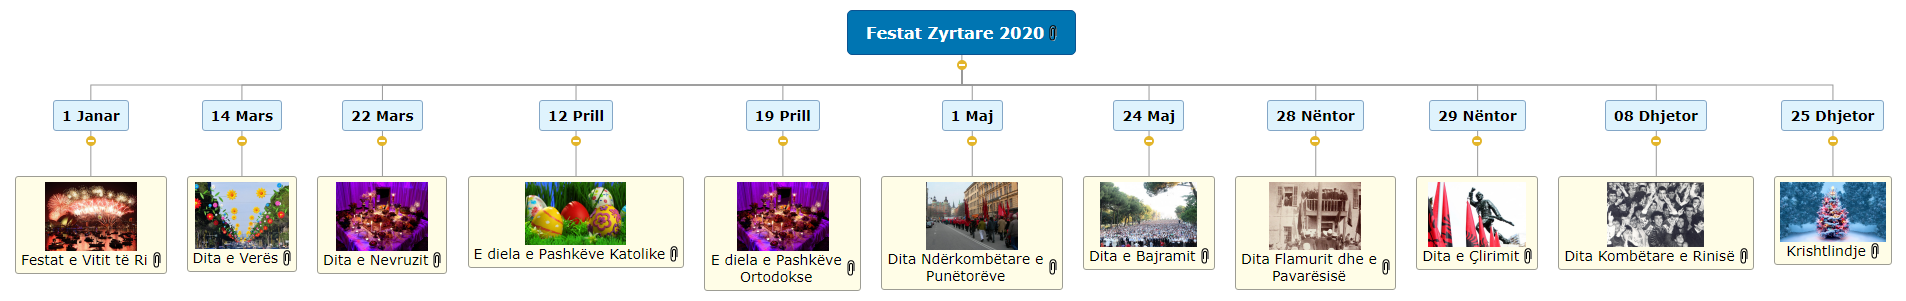 Festat Zyrtare 2020 1 Mind Map